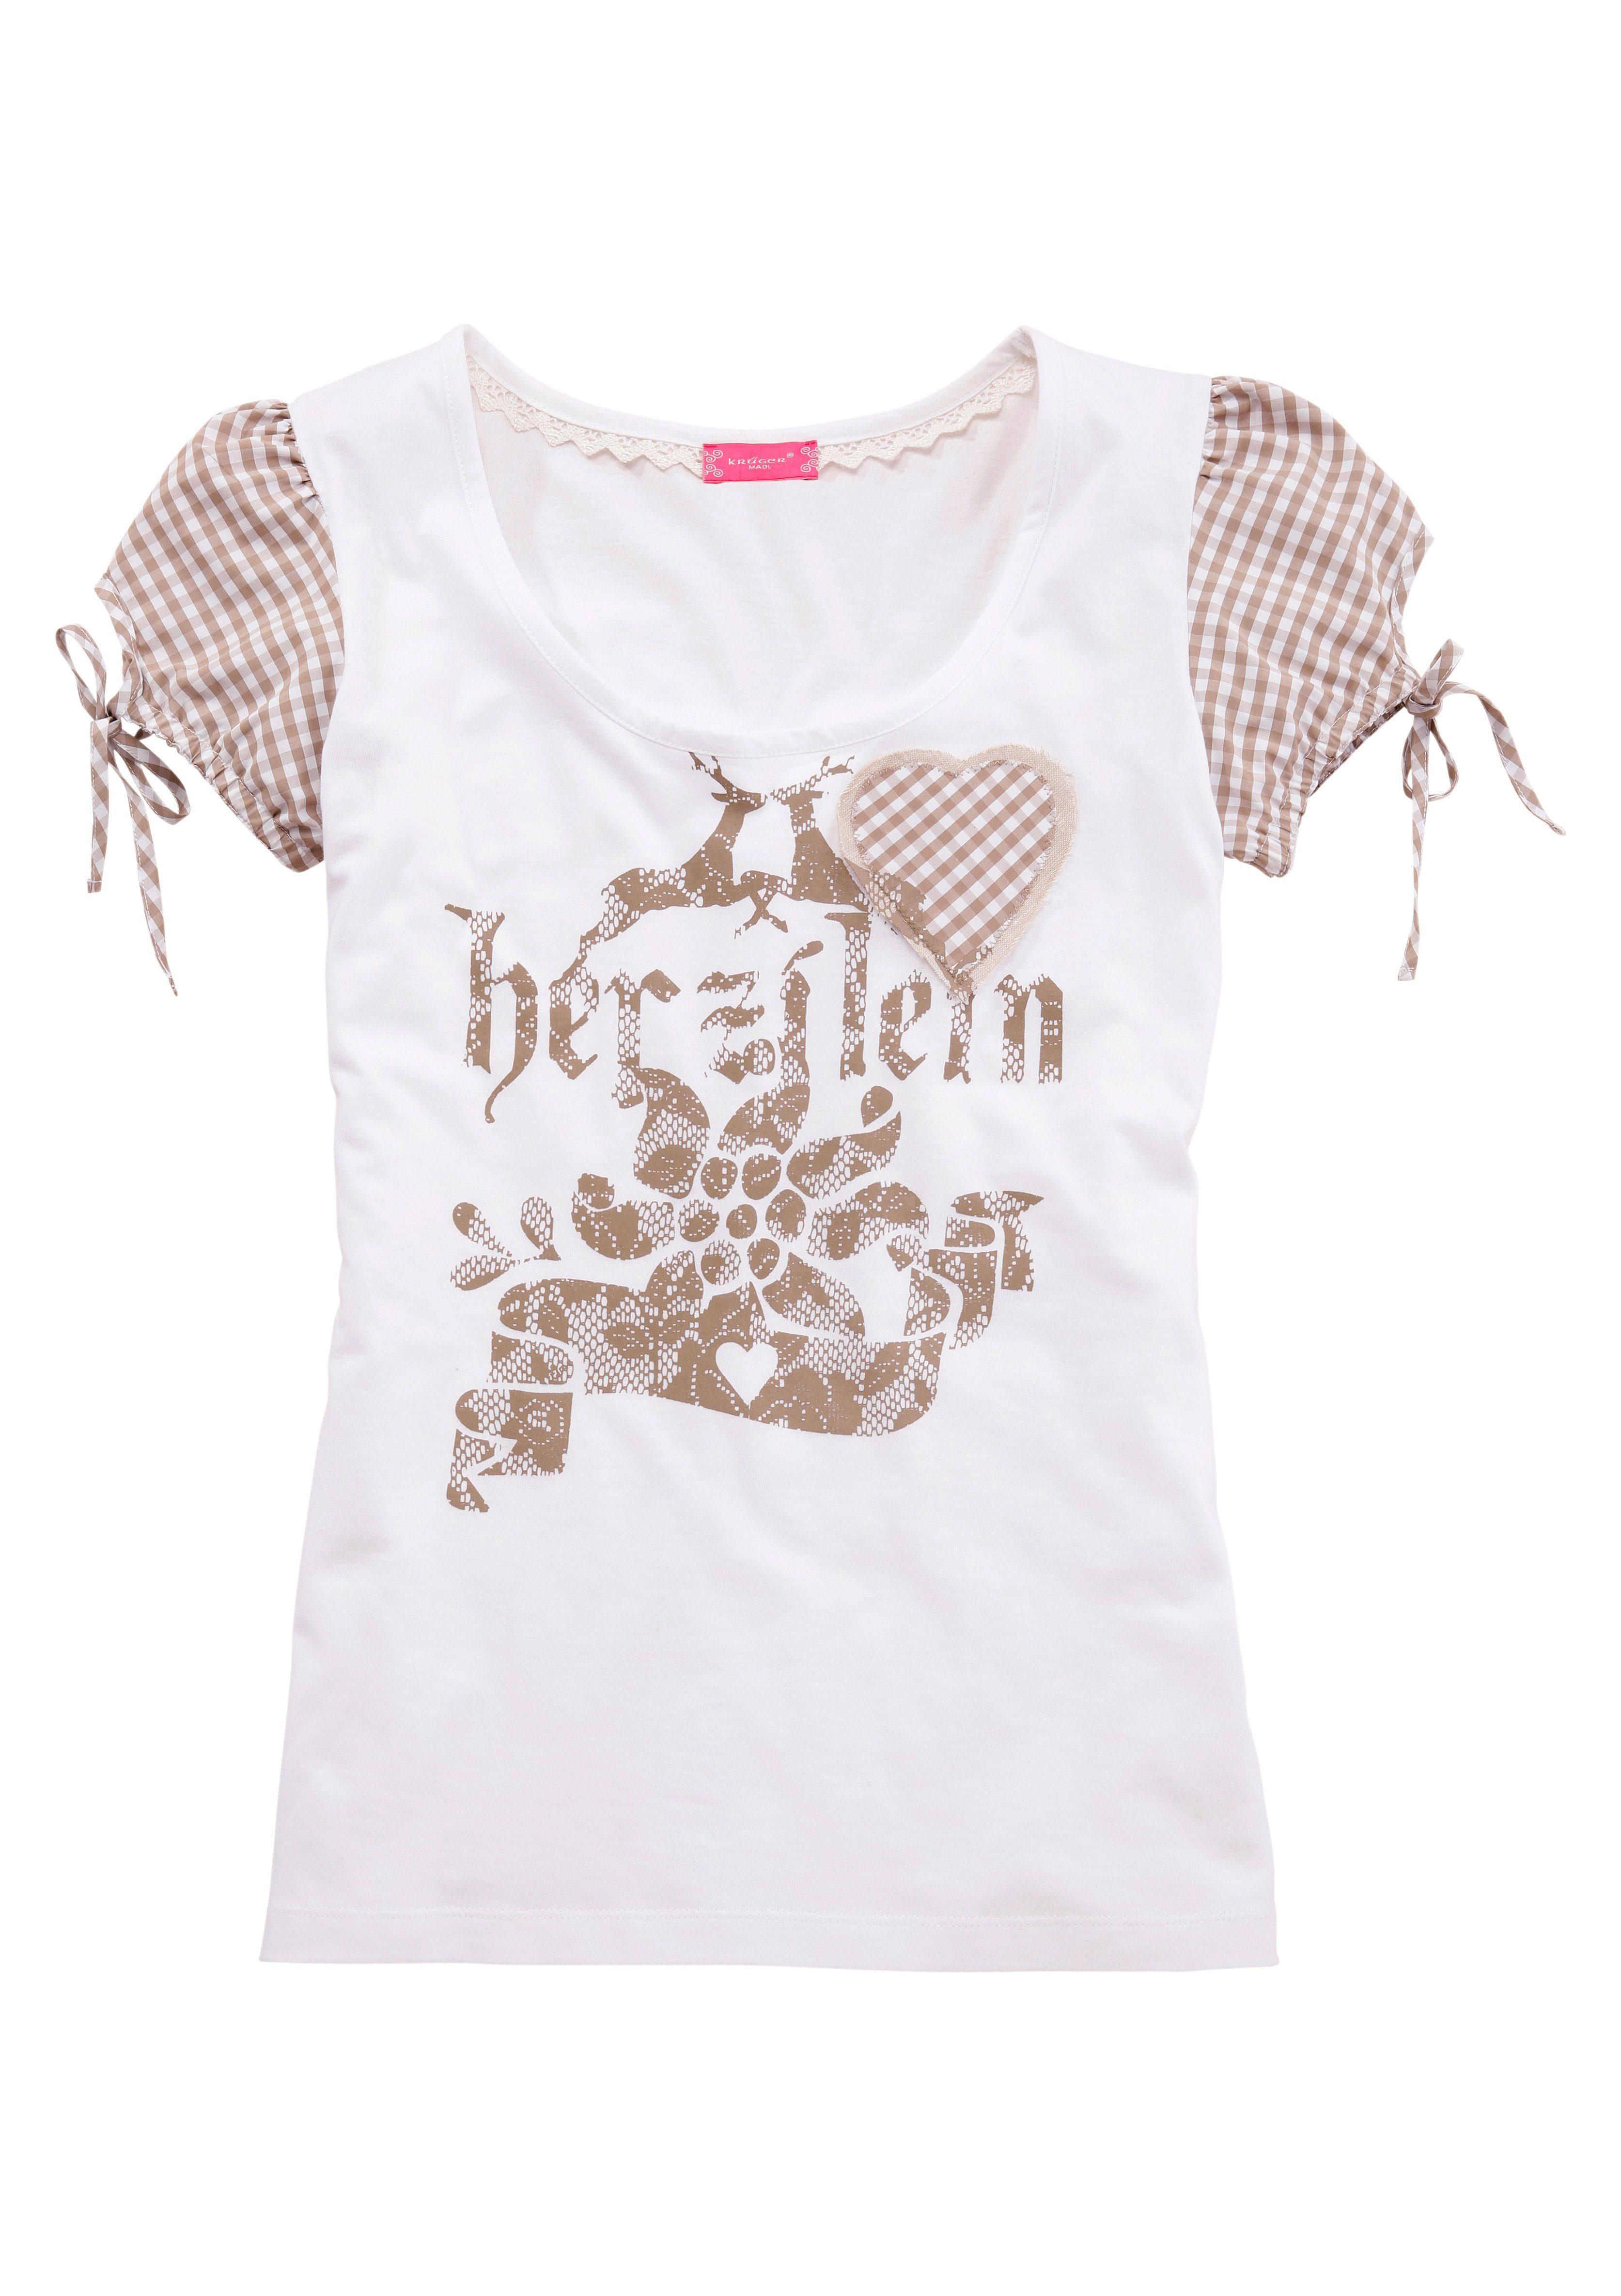 Krüger Madl Trachtenshirt Damen mit Puffärmel Damenmode/Bekleidung/Trachtenmode/Große Größen/Trachtenshirts